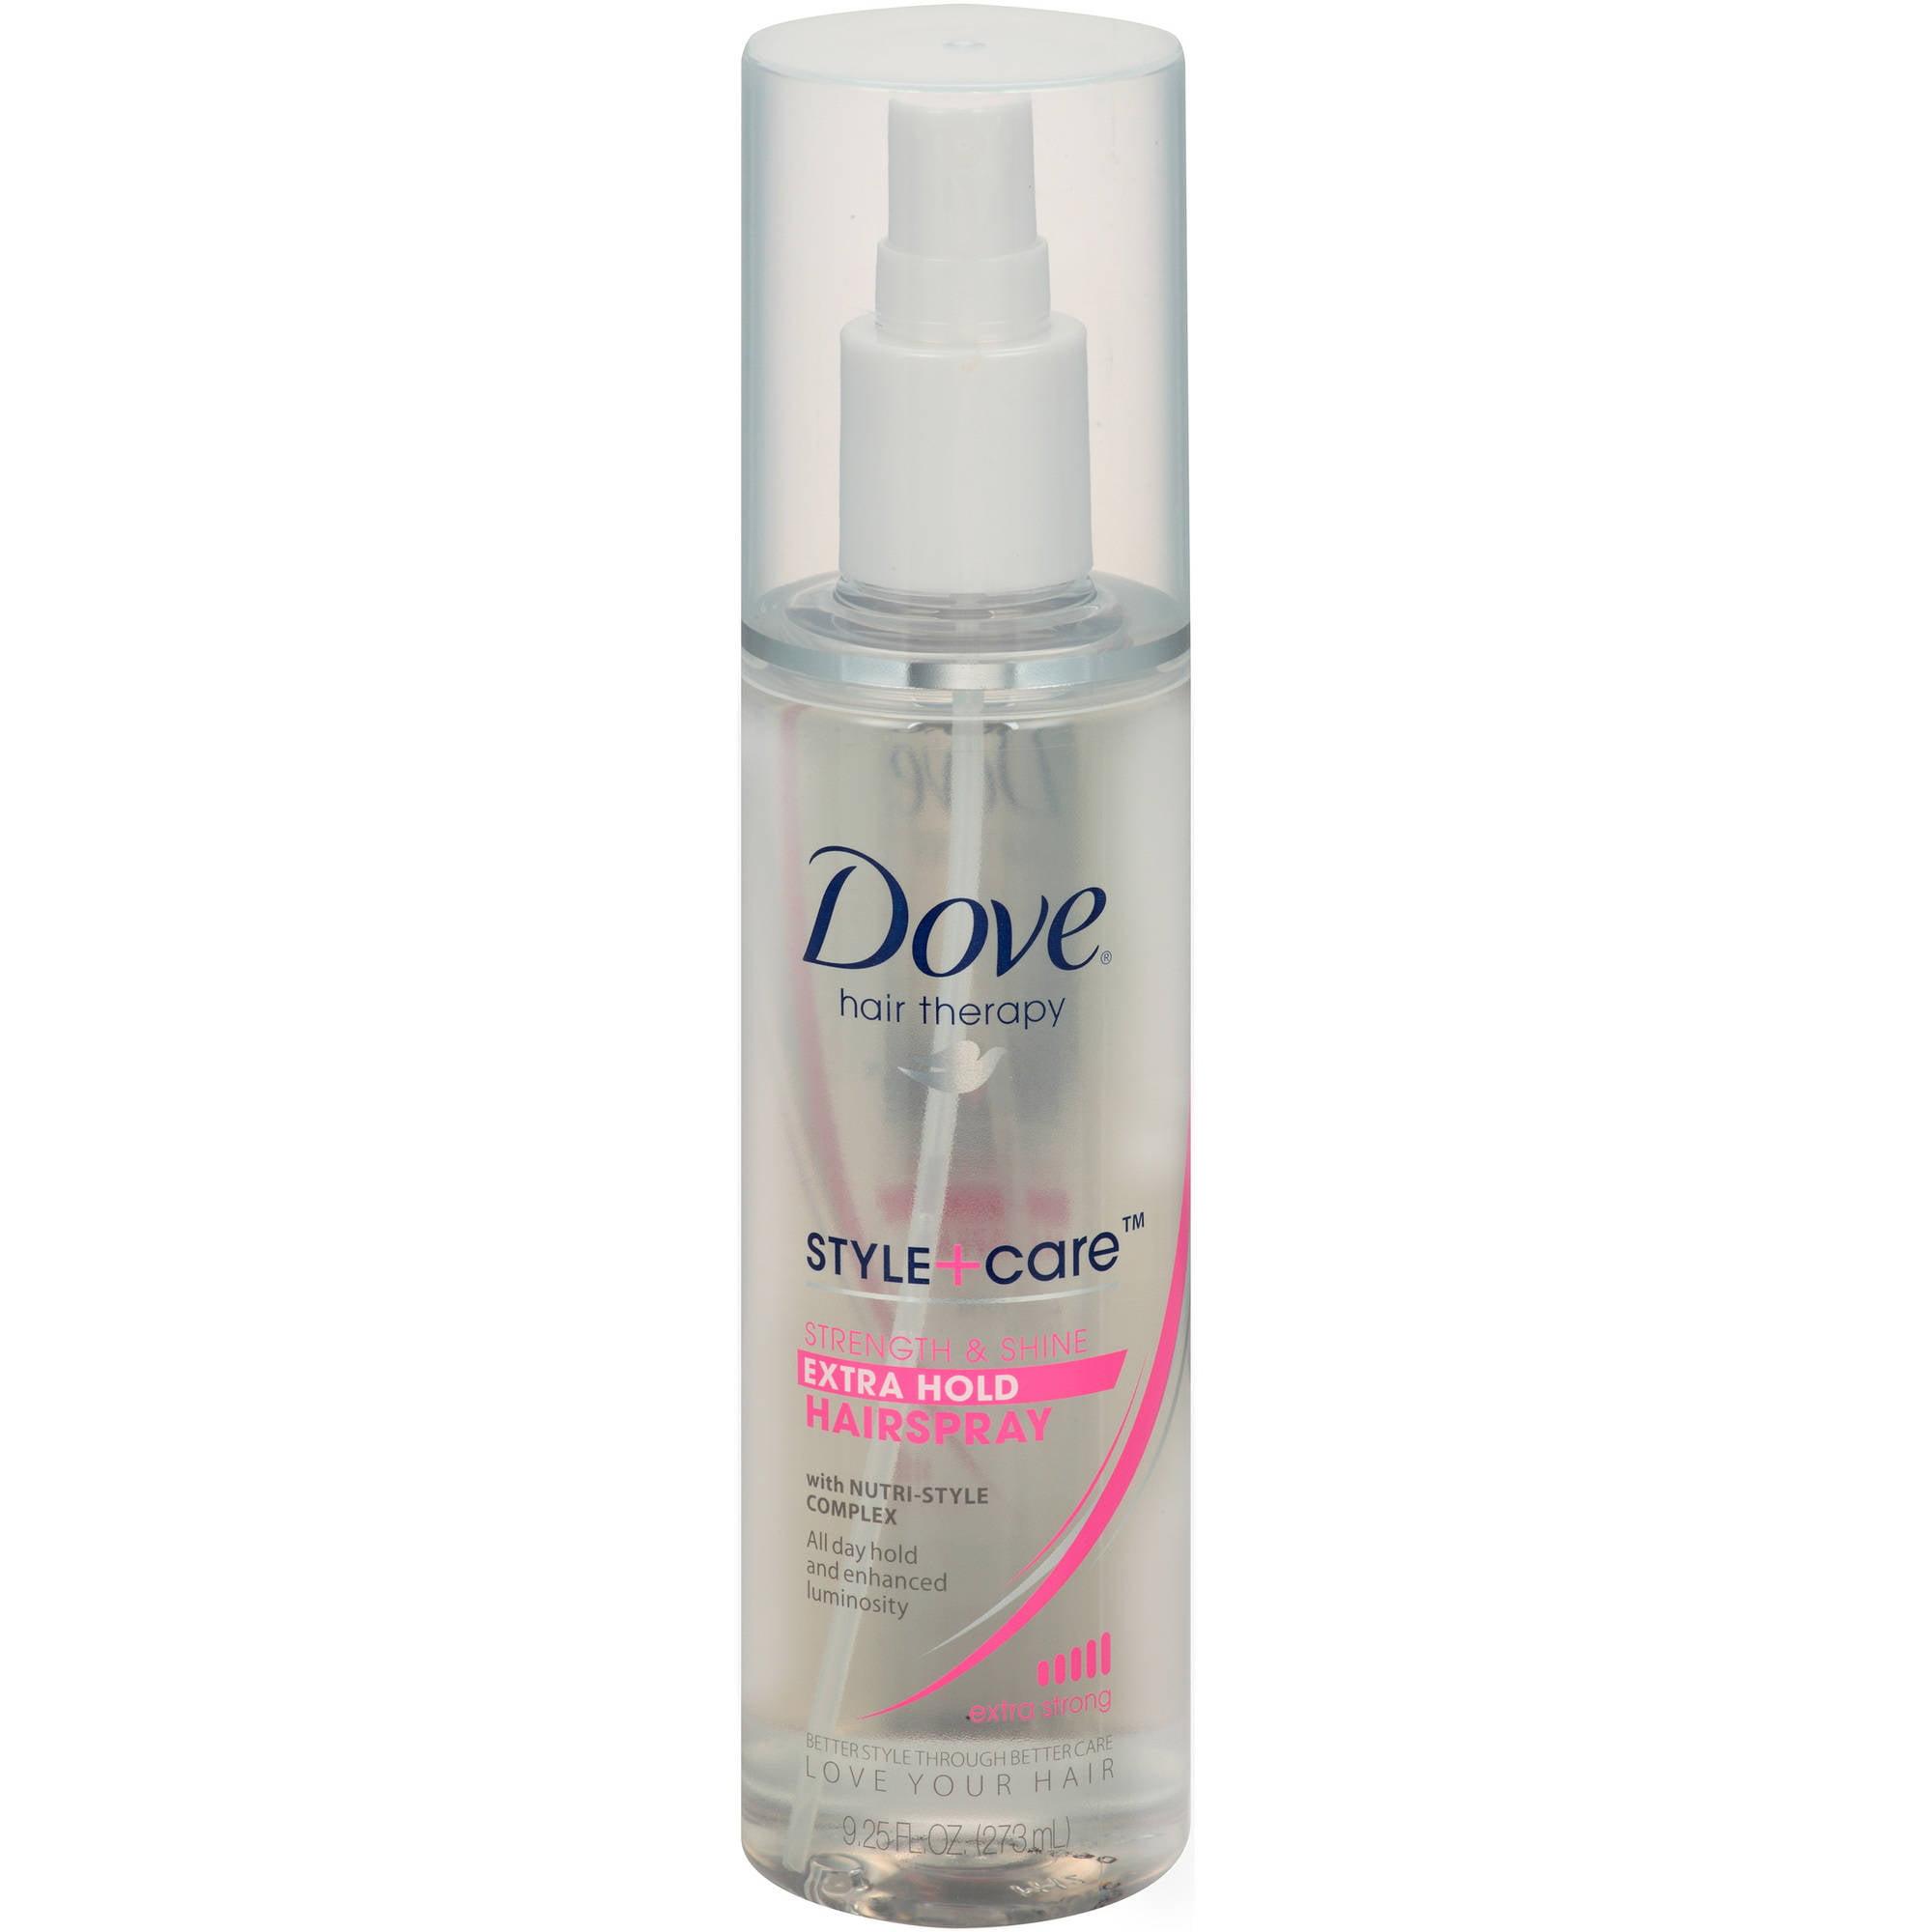 Dove Non-Aerosol Extra Hold Hairspray, 9.25 oz